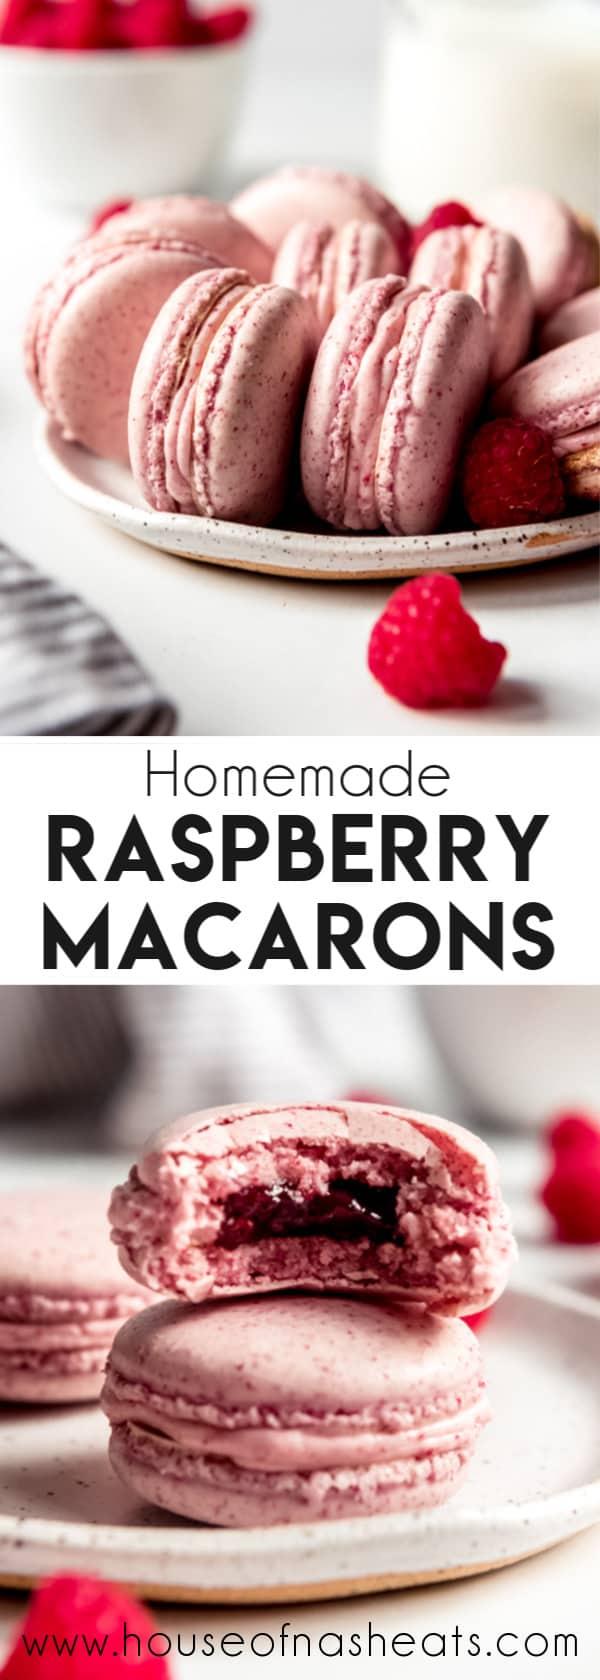 Raspberry Macarons - House of Nash Eats